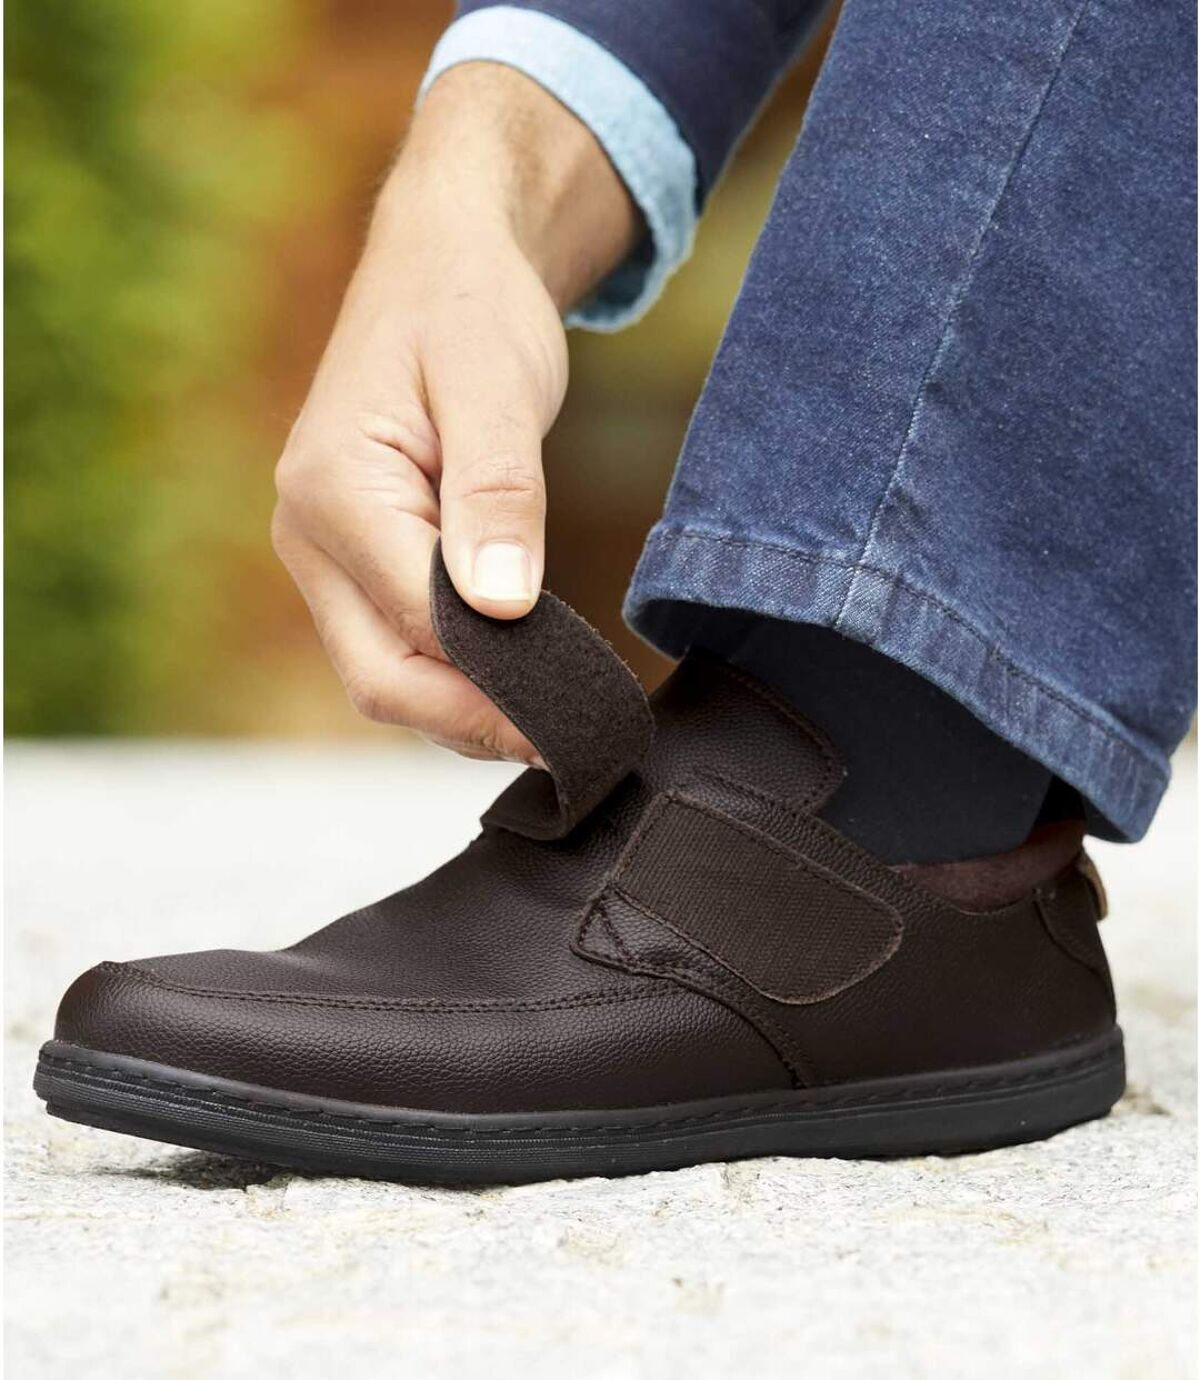 Men's Leather Hook-and-Loop Moccasins - Dark Brown Atlas For Men